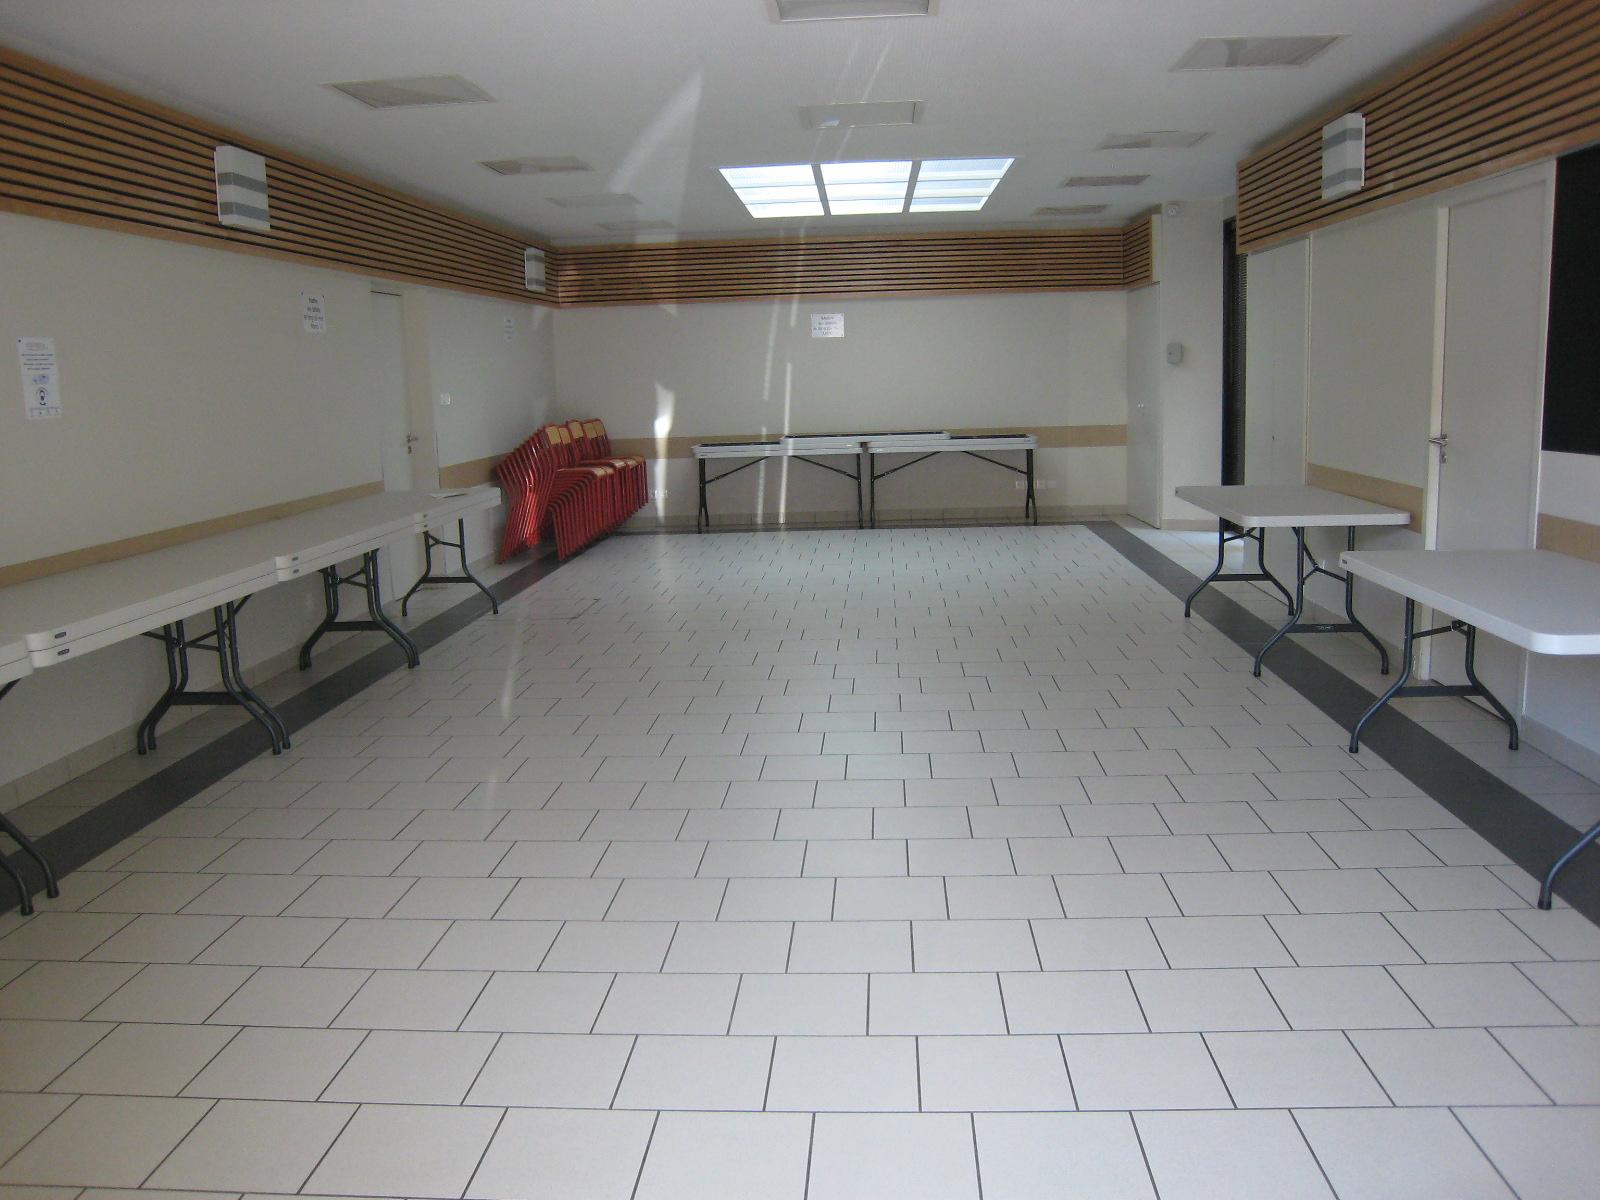 Salle des charmilles.JPG